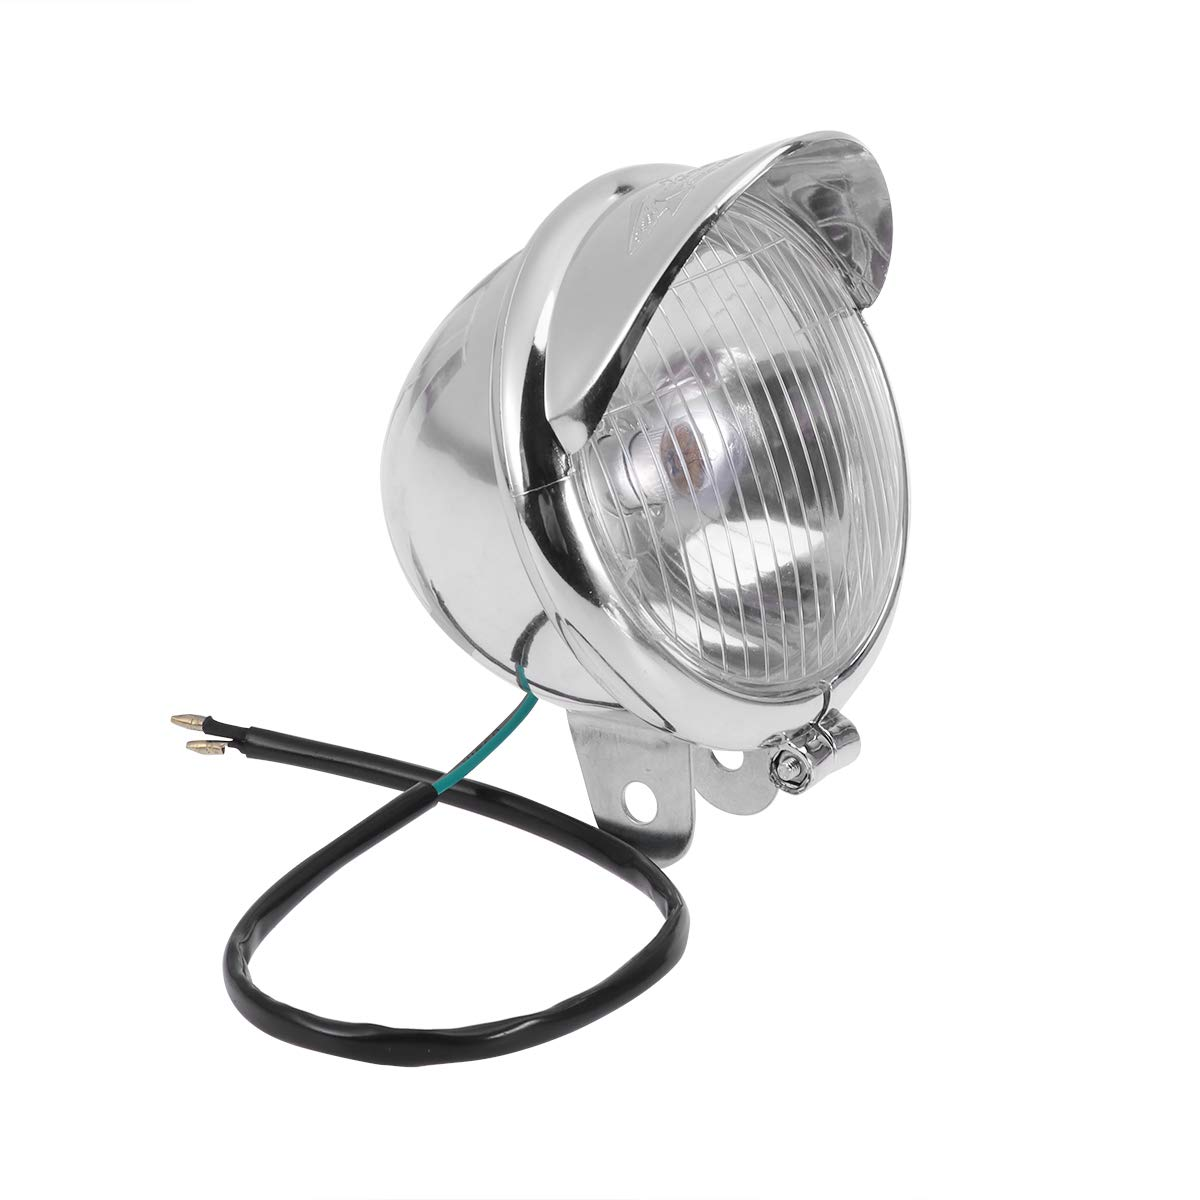 LIOOBO 2Pc Universal Motorcycle Rear LED Fog Light Warning Lamp Anti-Collision Taillight (Silver)